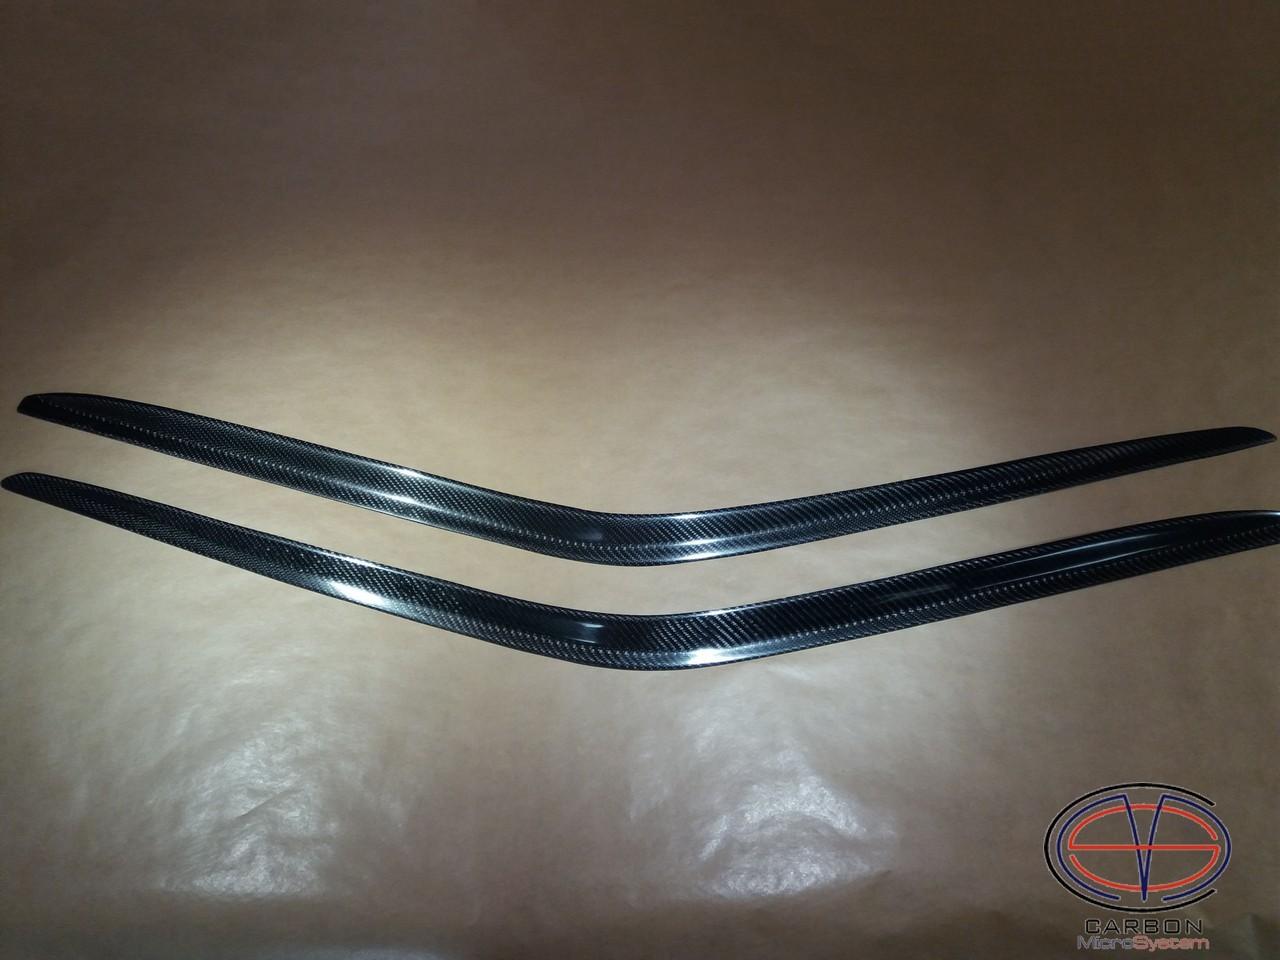 Window Wind - Rain Deflectors from Carbon Fiber for TOYOTA Celica  ST162, ST165 GT4 2018-13